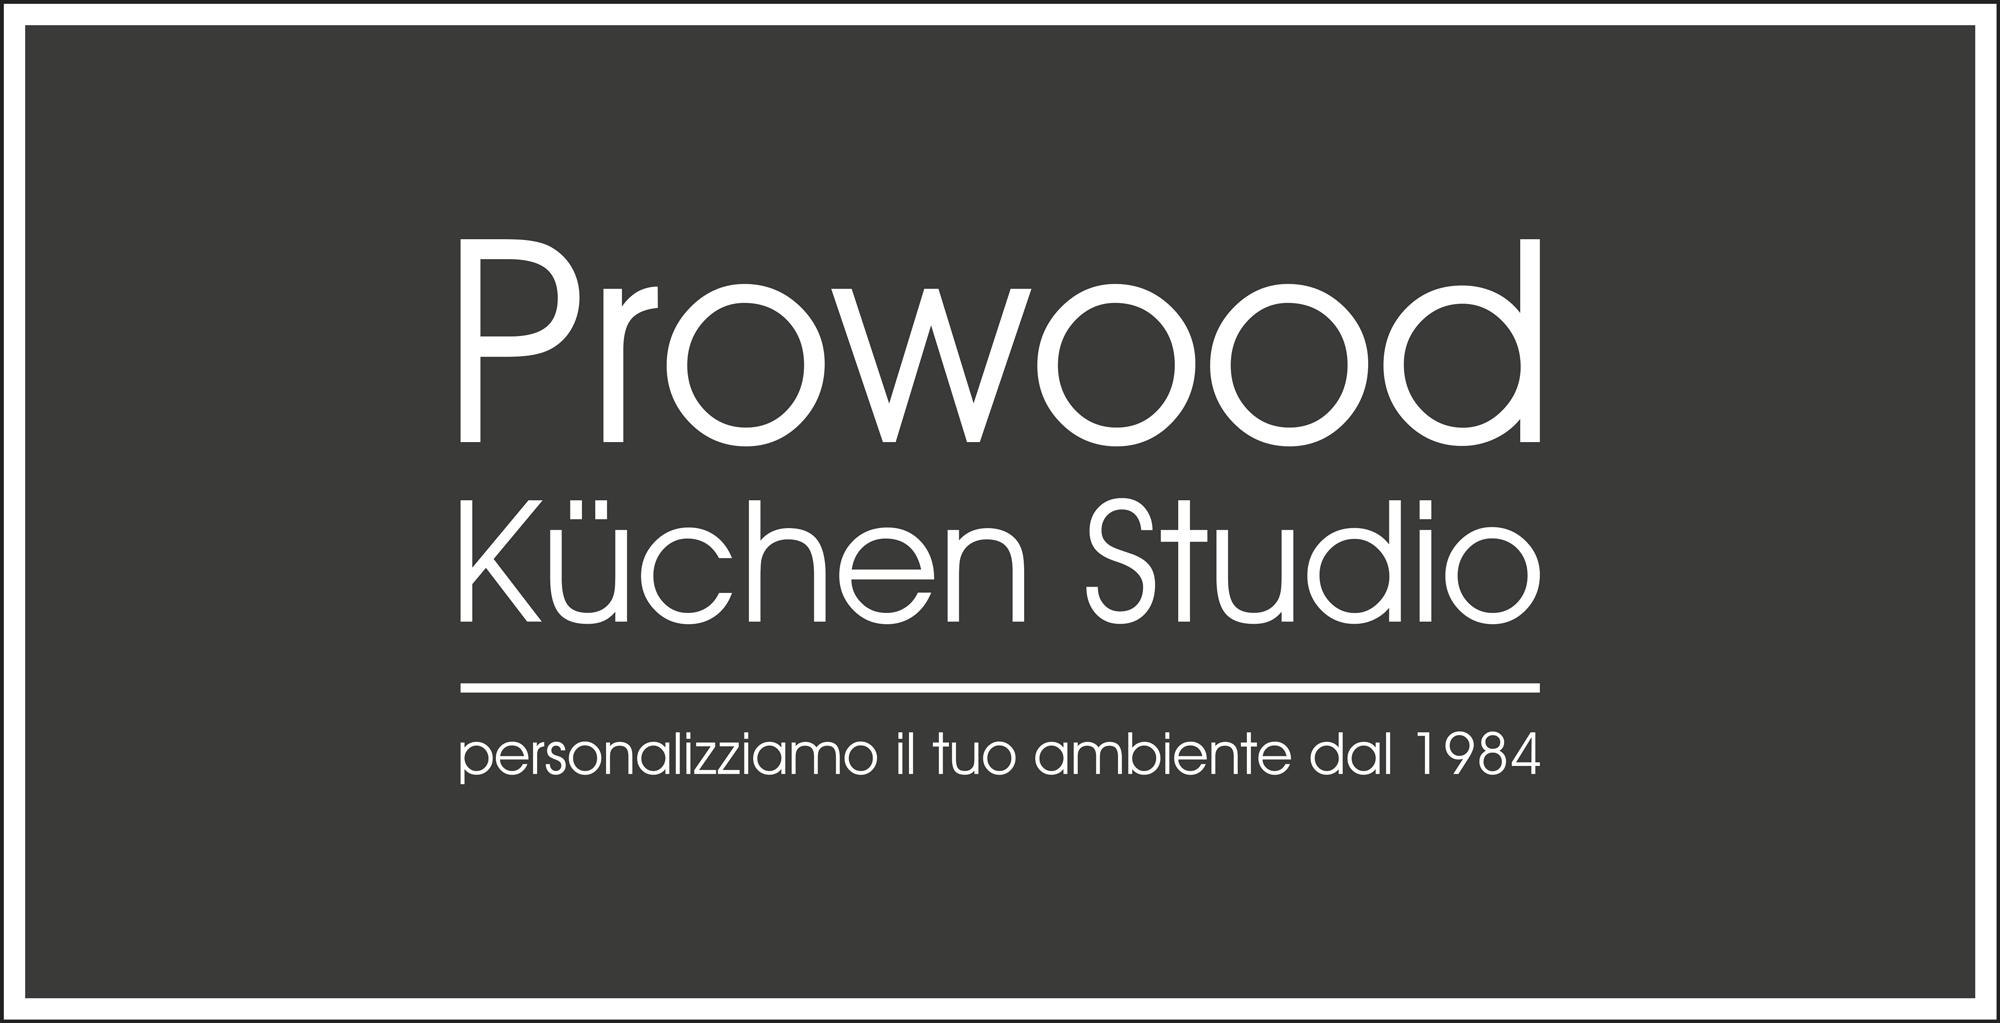 logo design marchio prowood